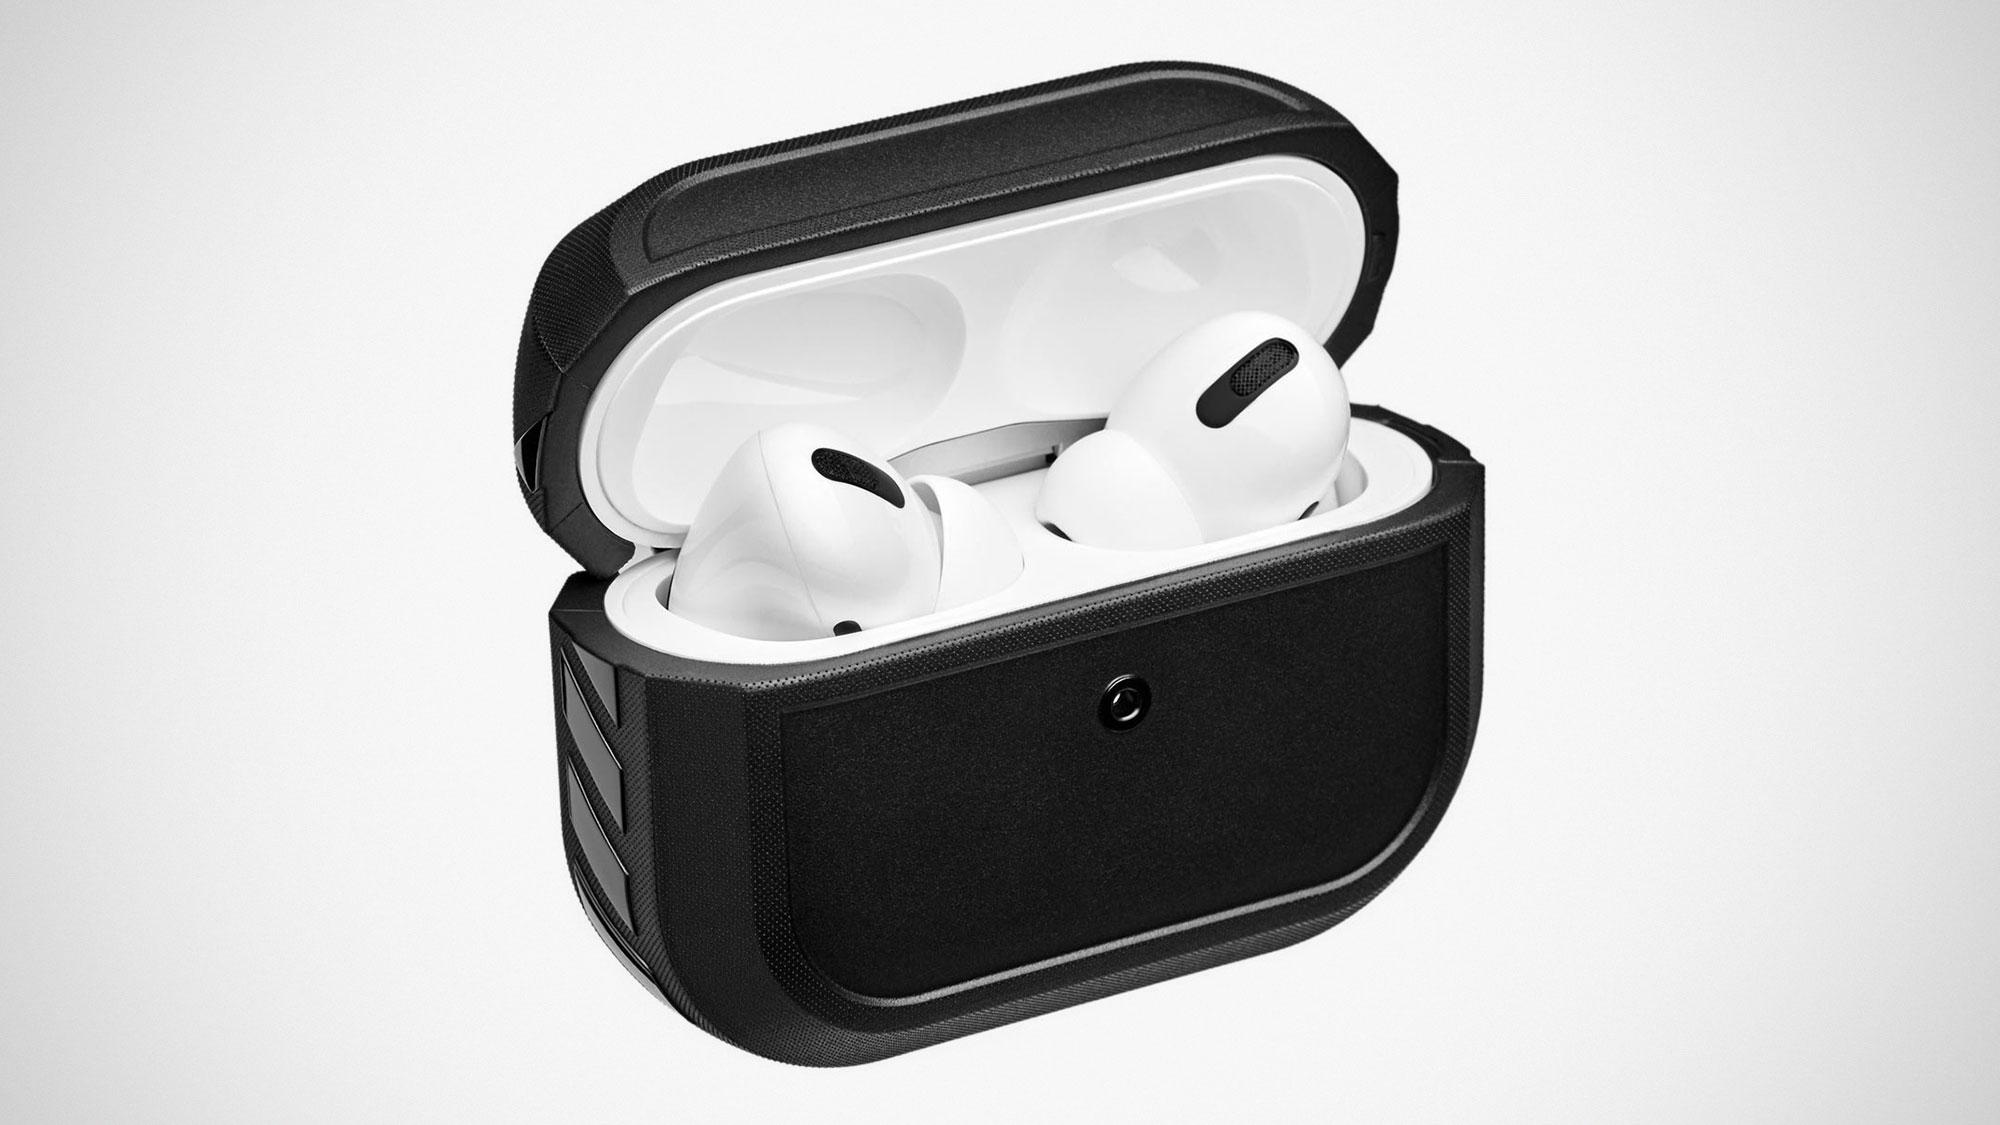 Dbrand Apple AirPods Pro Grip Case